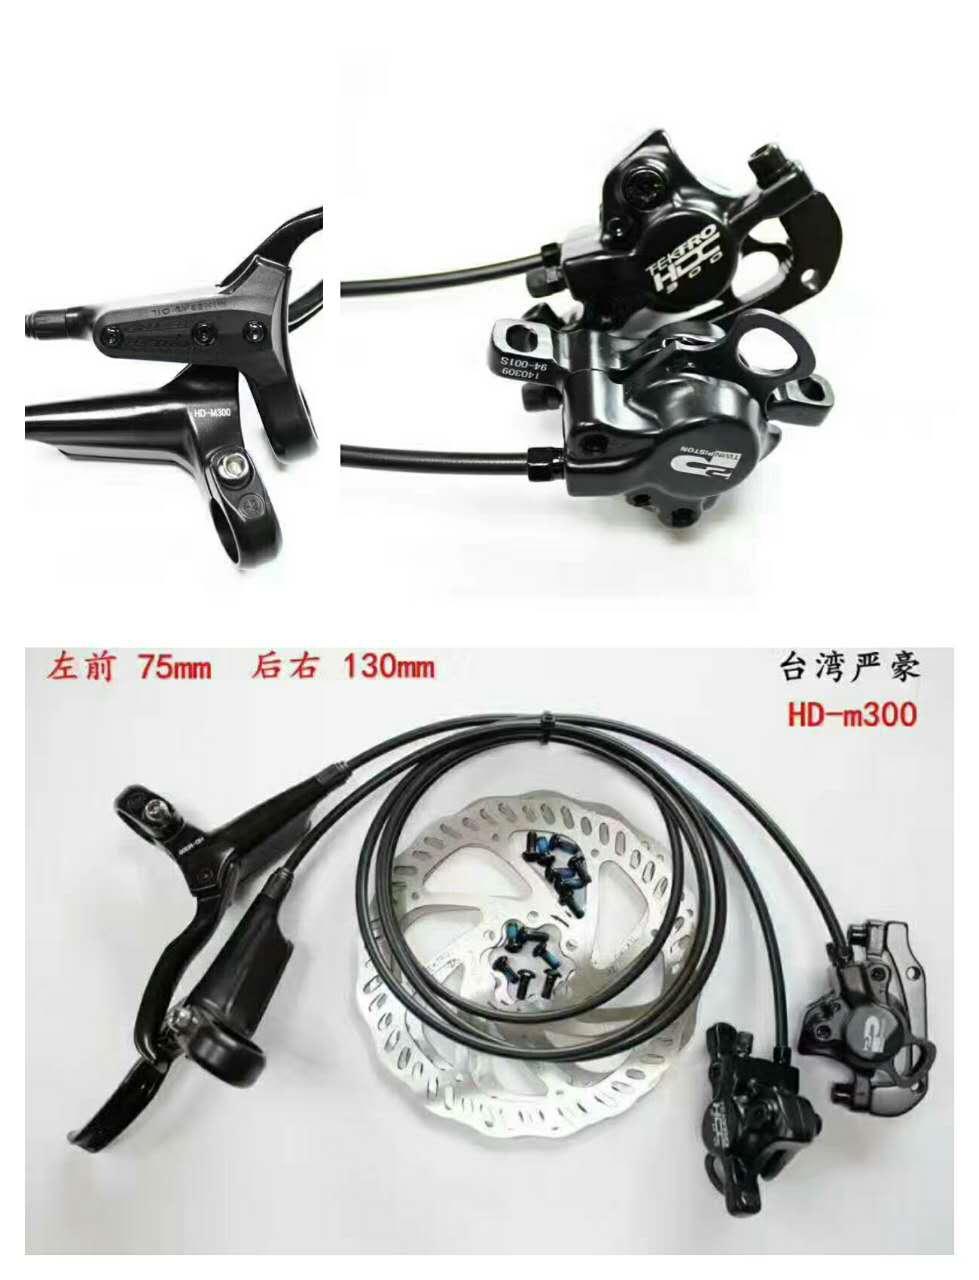 Original Tektro HDC300 right front left rear hydraulic mineral oil press MTB bicycle brake tektro 300 hydraulic disc brake